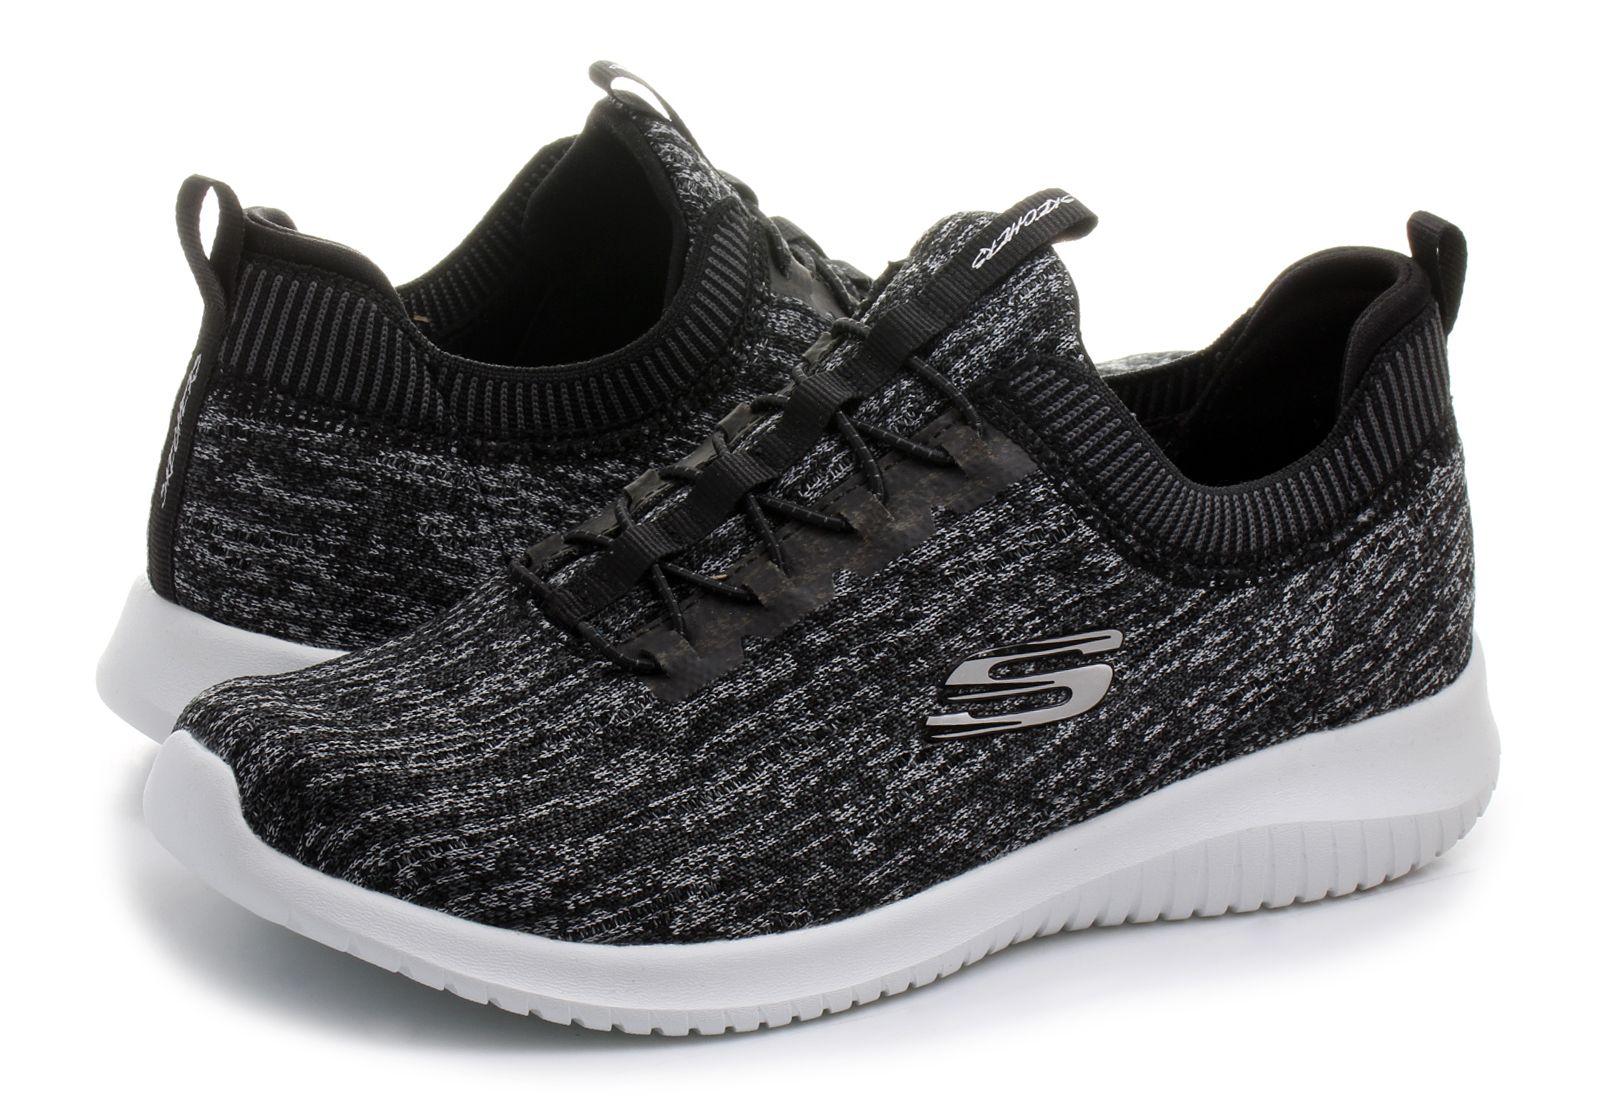 Skechers Shoes Ultra Flex Bright Horizon 12831 Bkgy